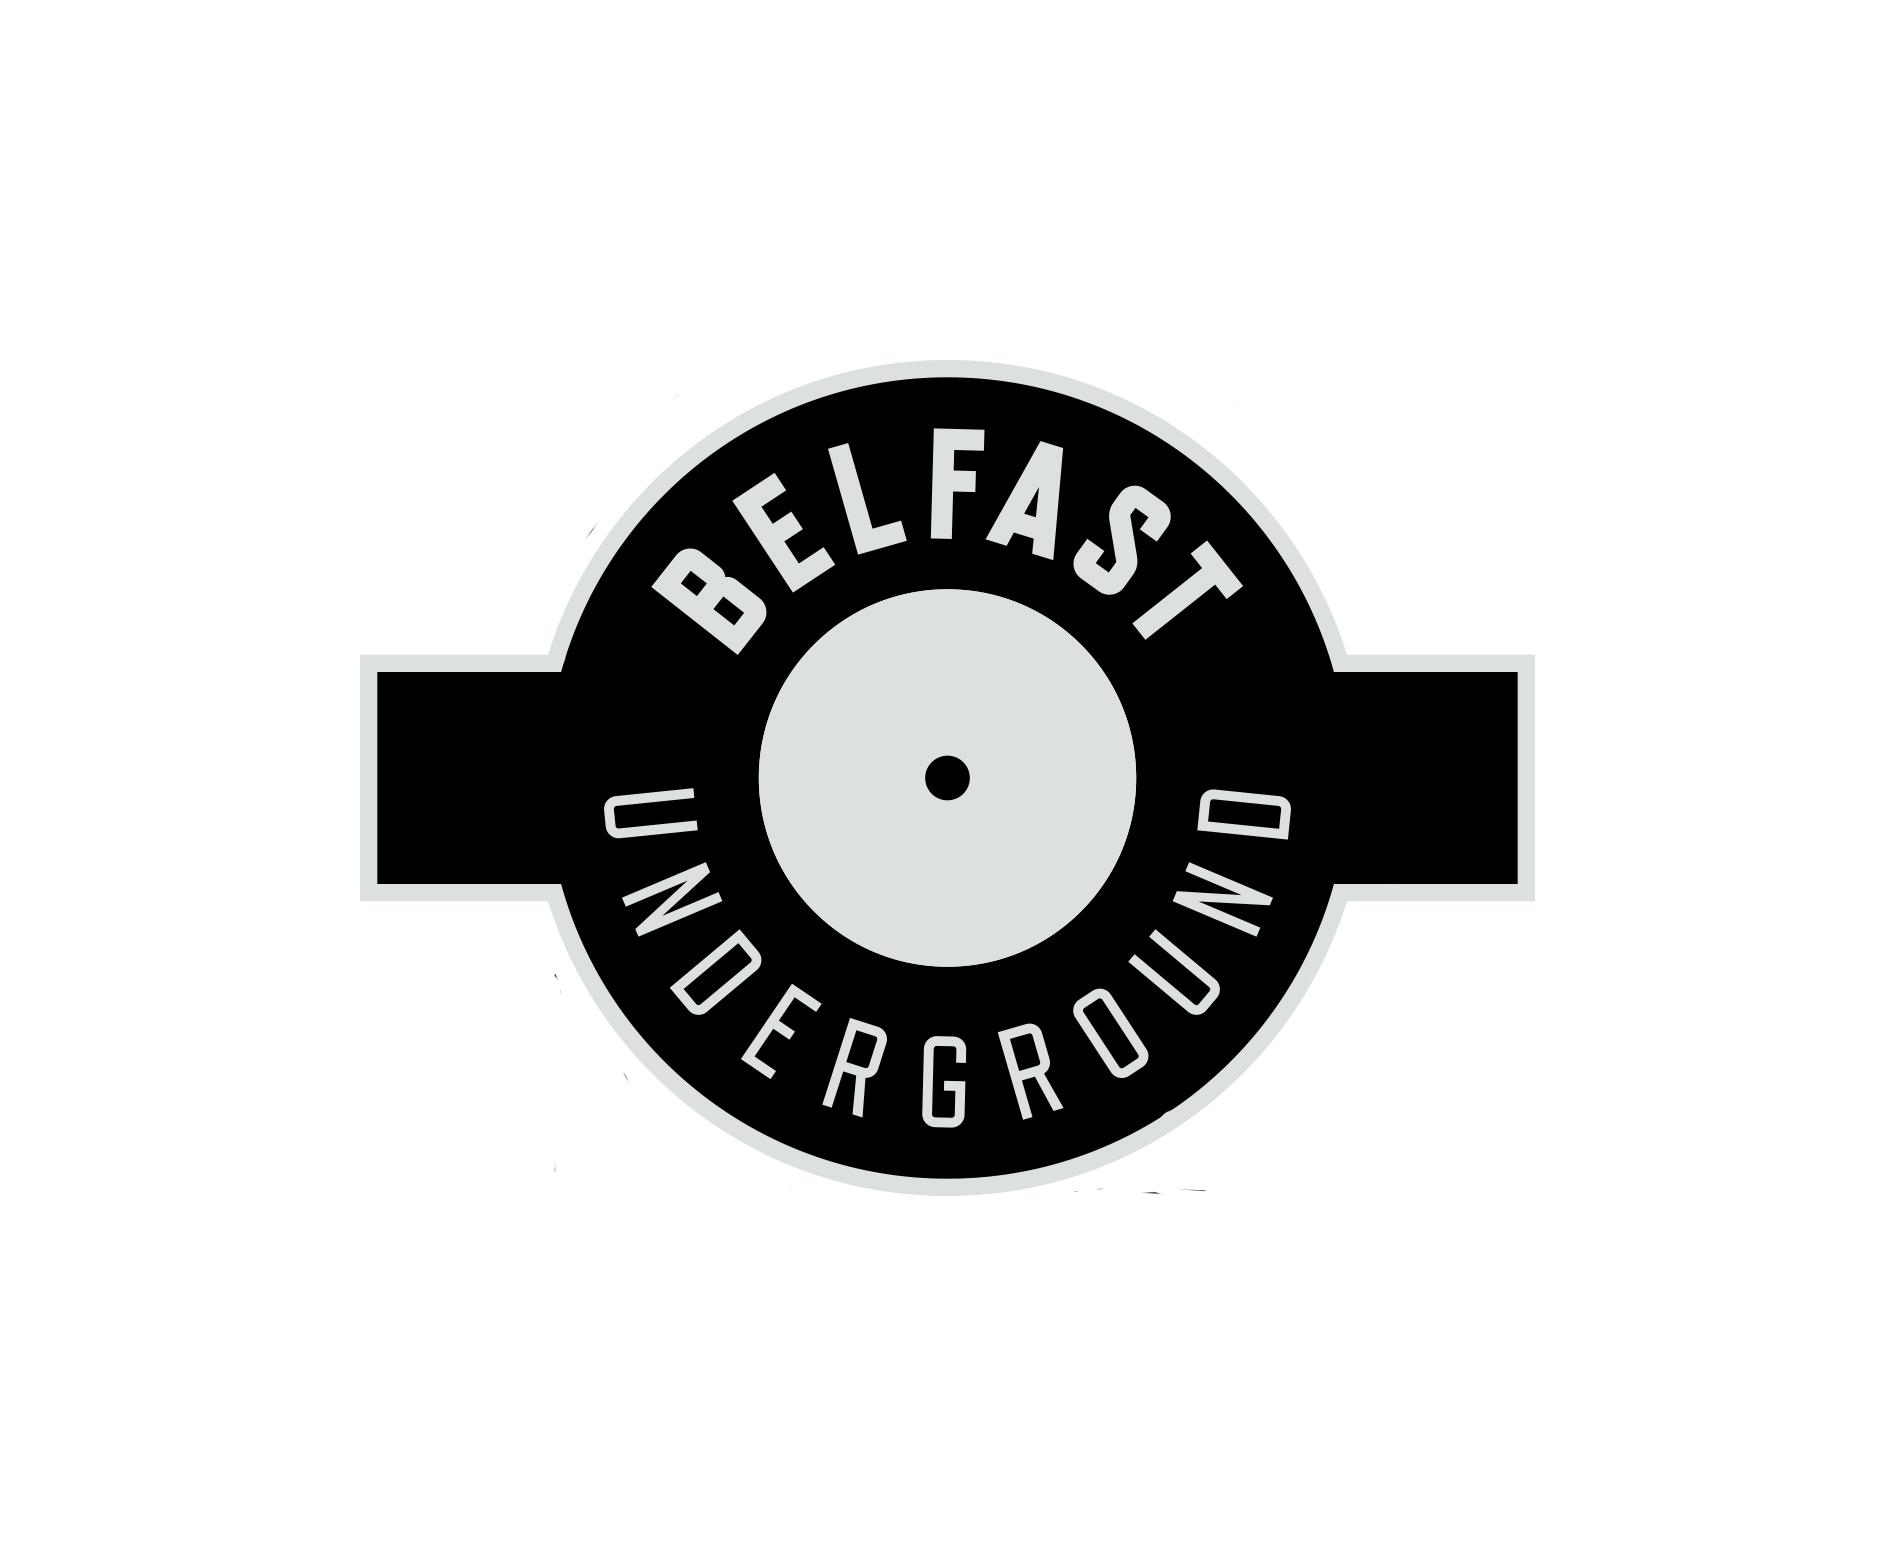 1279-Belfast Underground T Shirt Design (SINGLE COLOUR SKELETON)